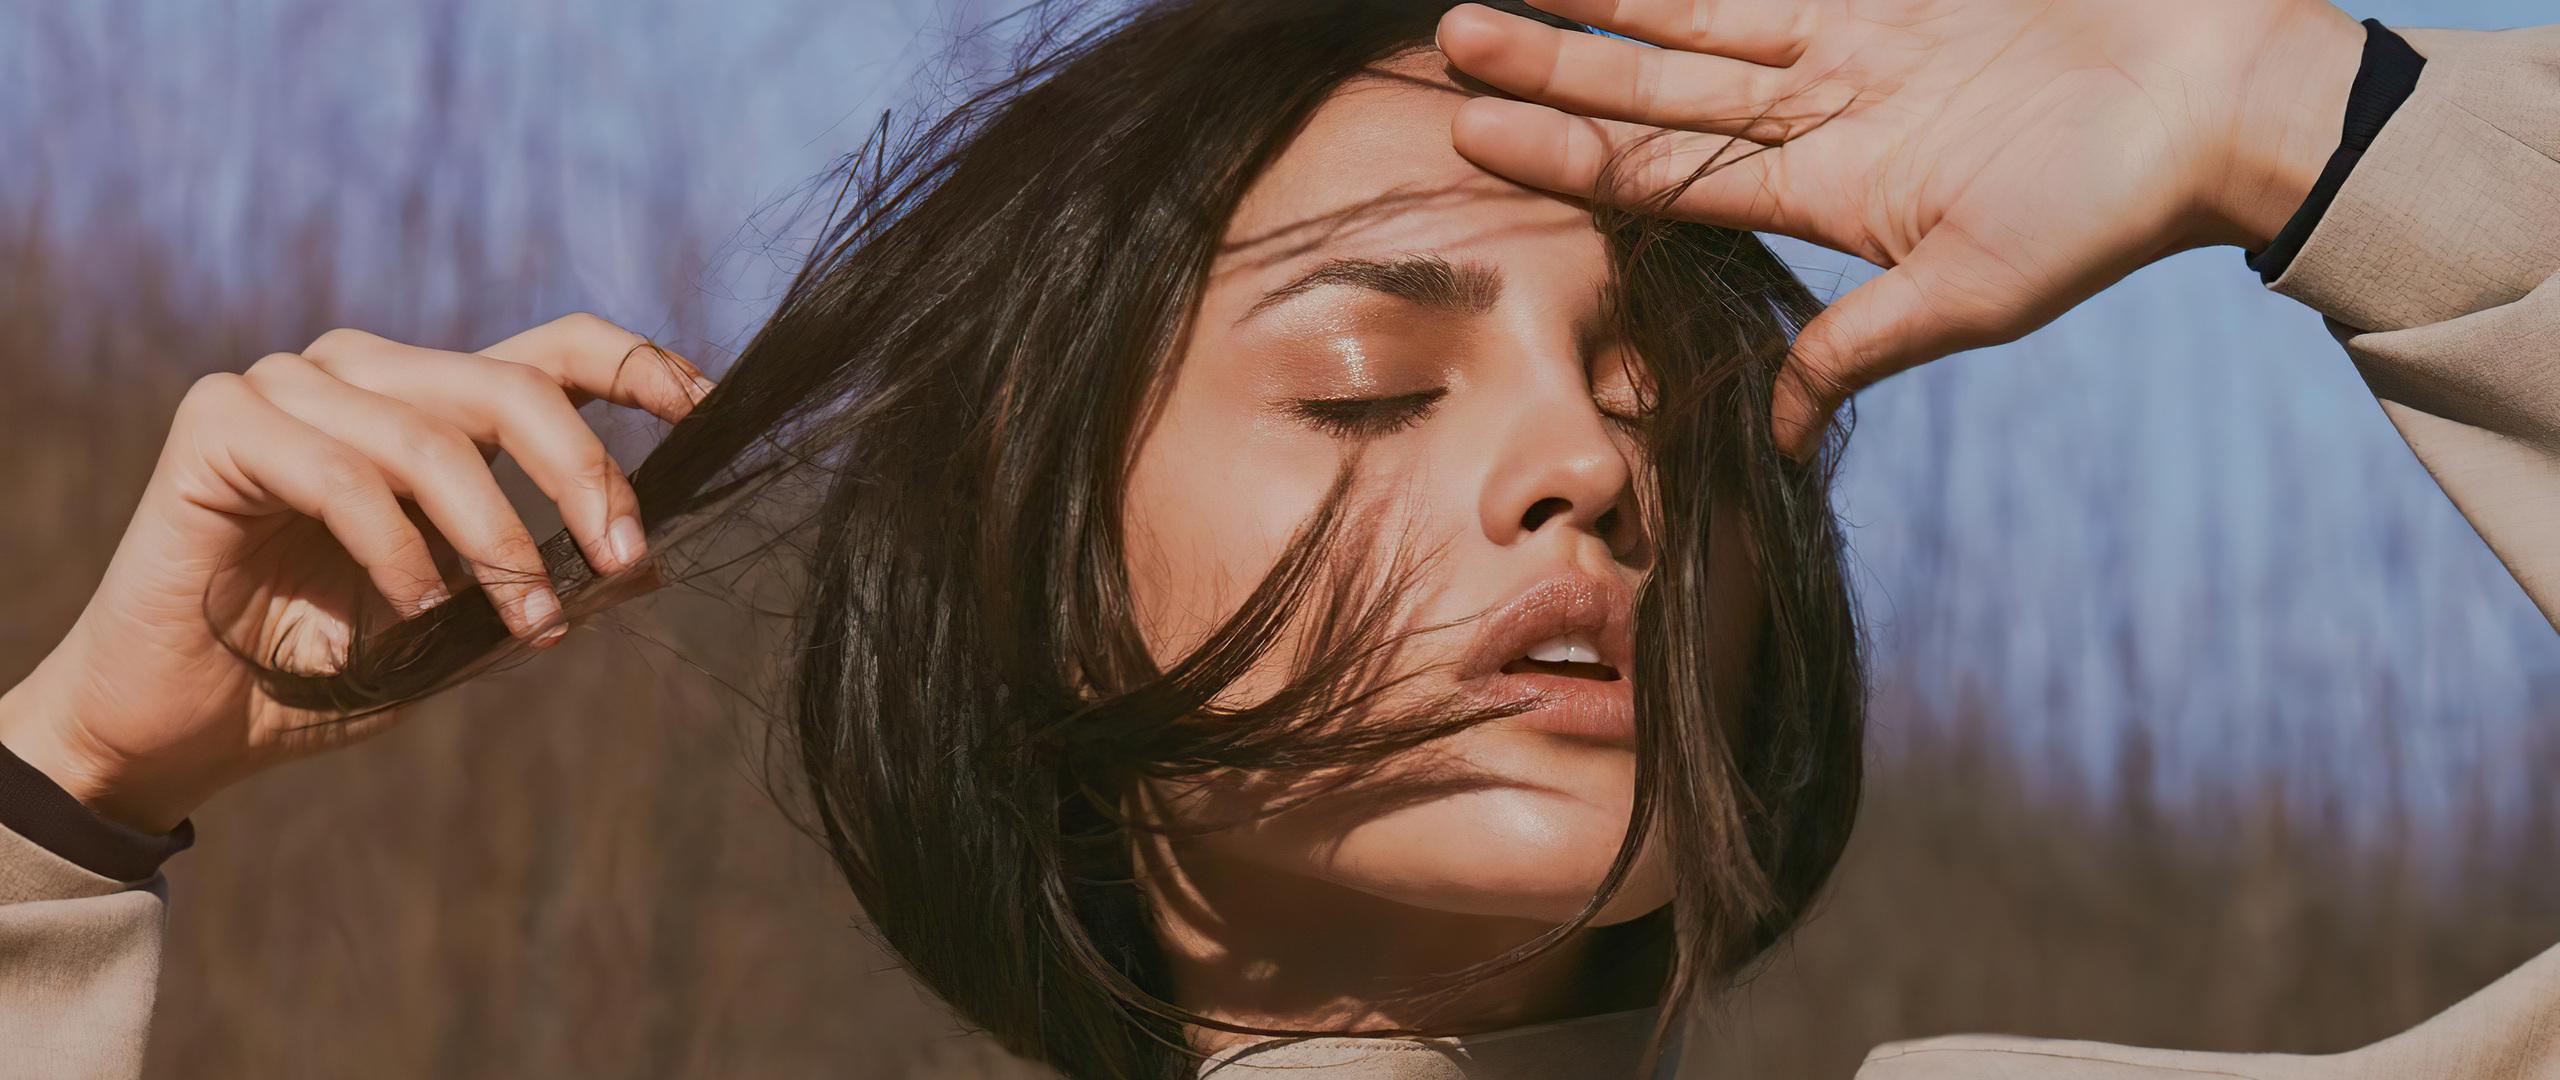 eiza-gonzalez-the-amazing-magazine-photoshoot-5k-52.jpg